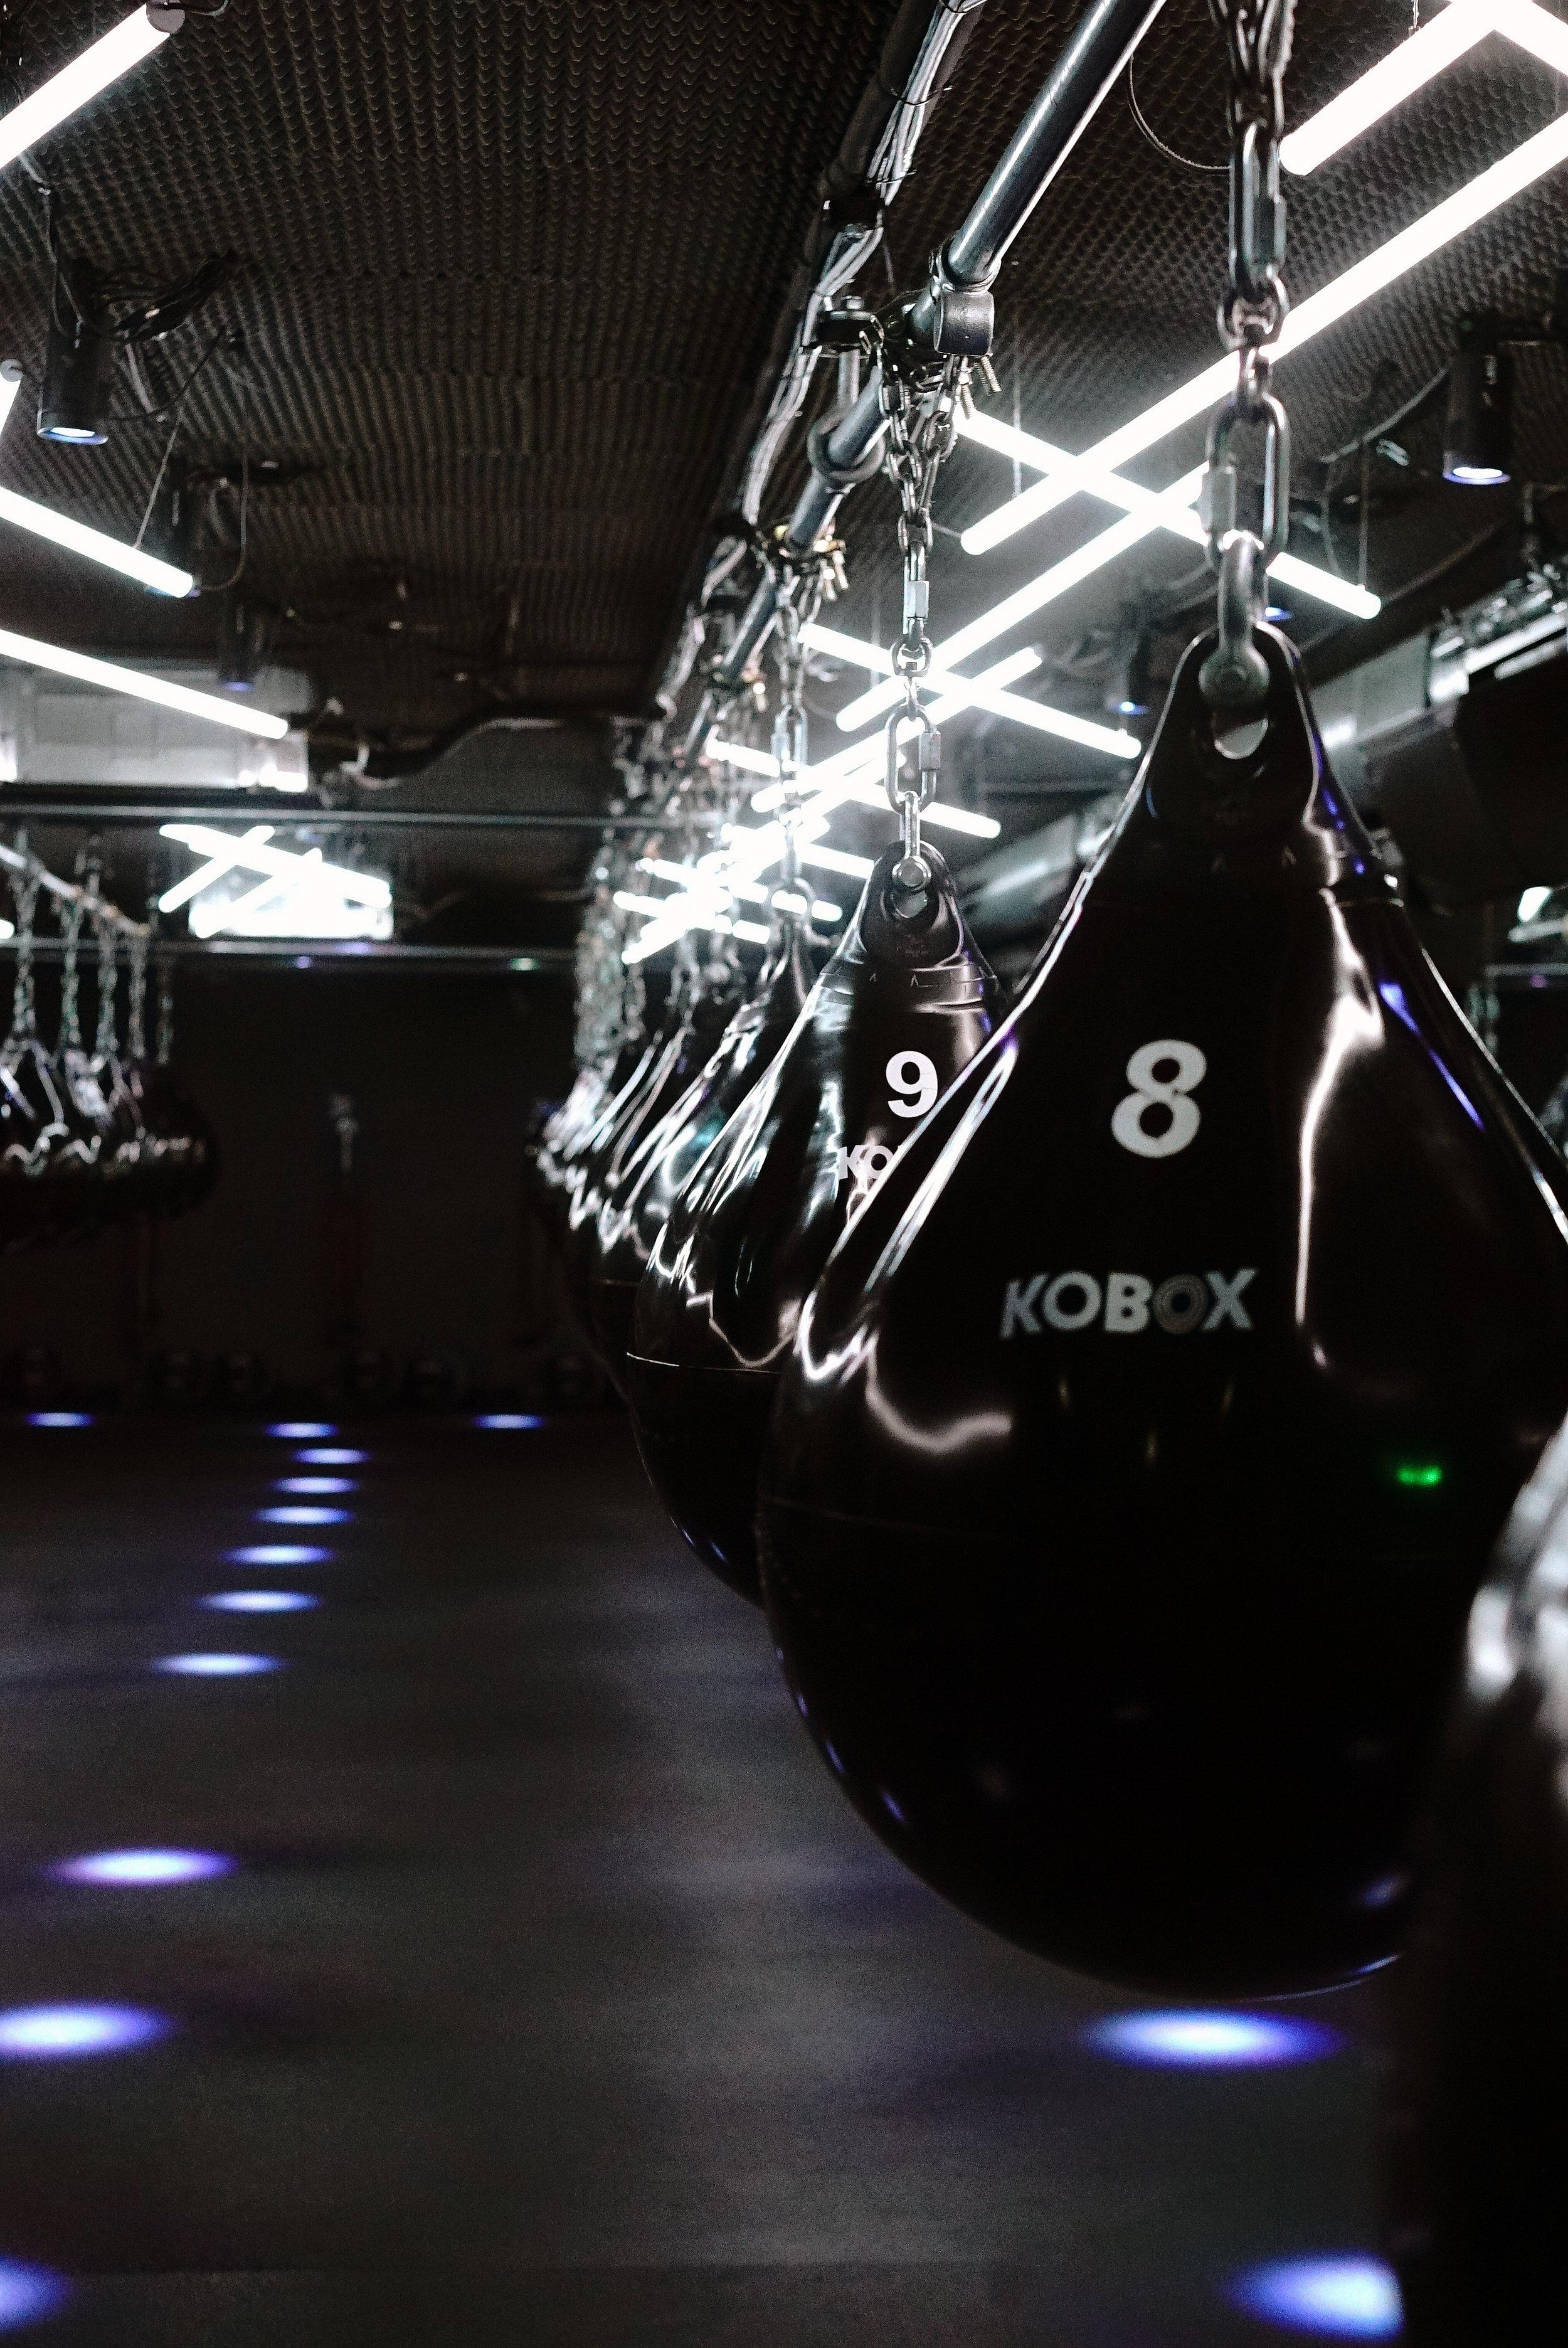 KOBOX Boxing Bags.JPG